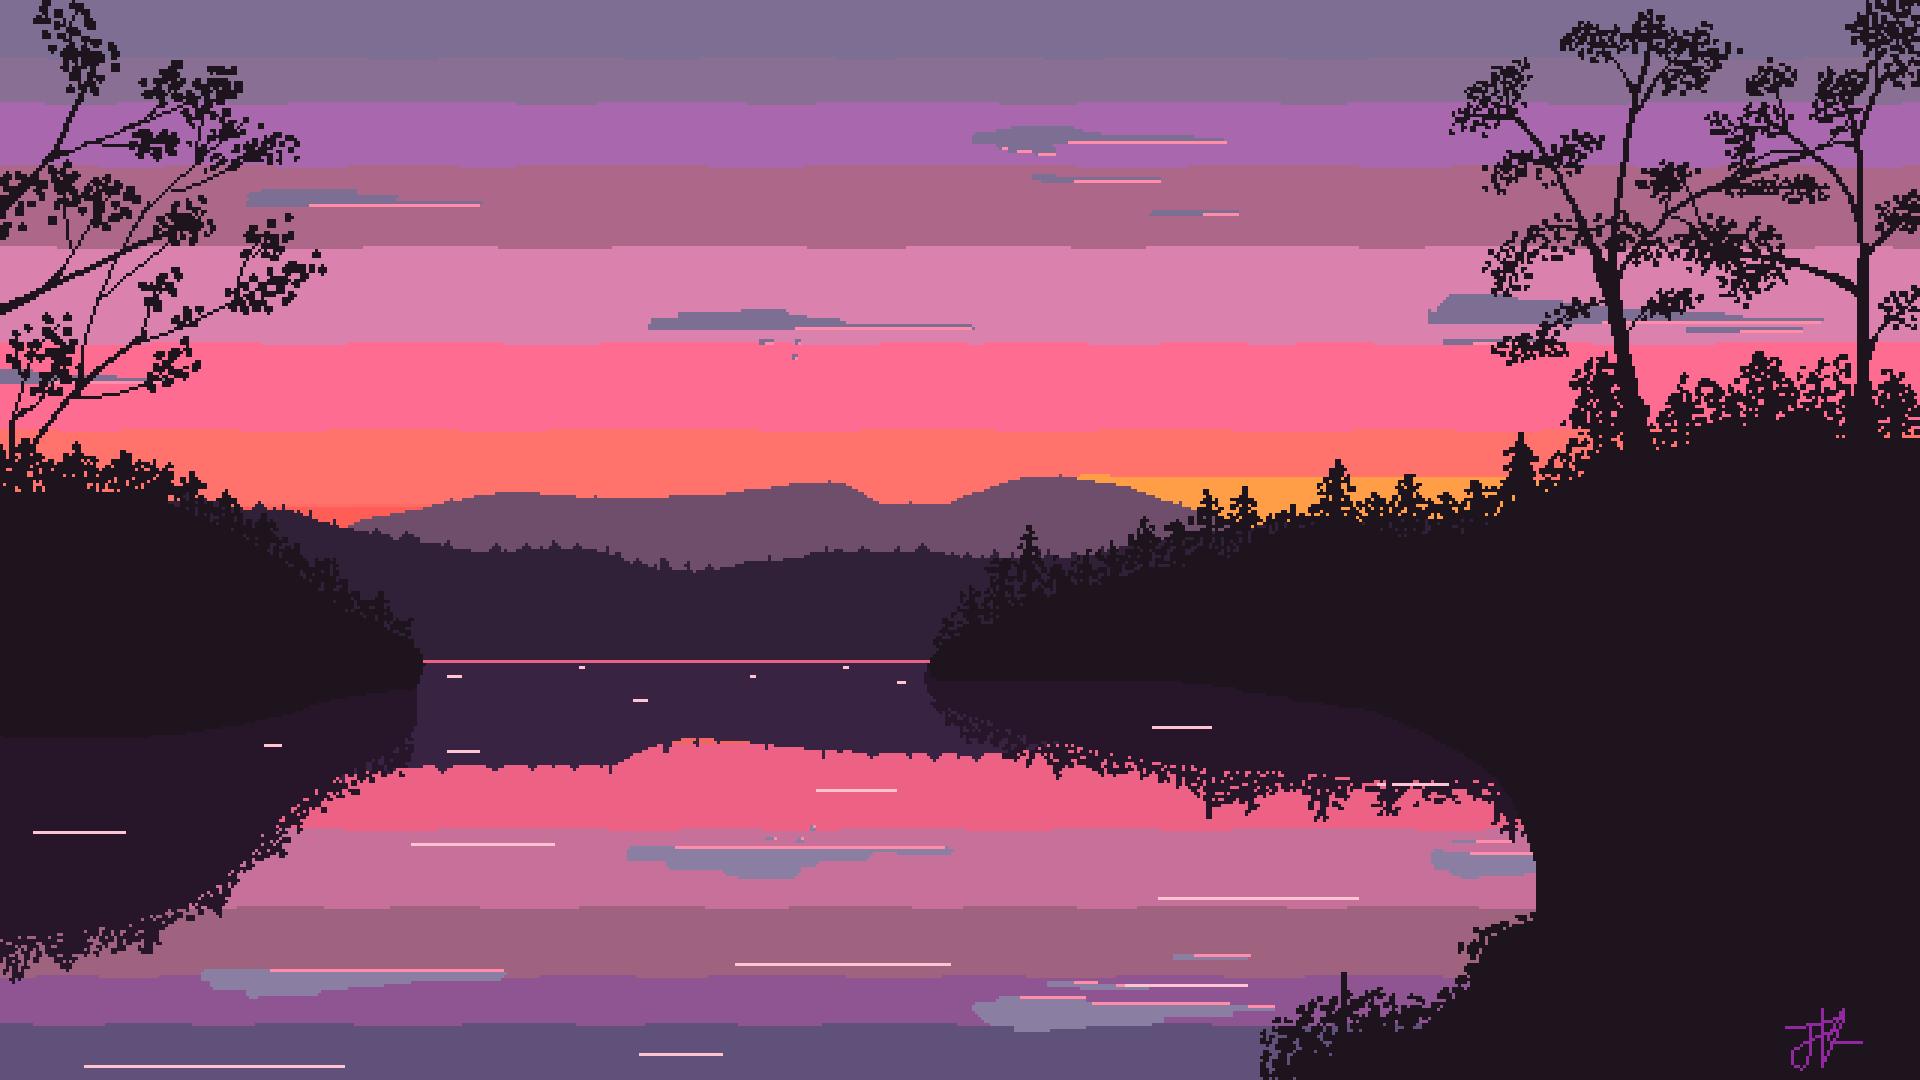 Cool Desktop Wallpaper Download Free Full Hd Wallpapers Backgrounds In 2020 Pixel Art Landscape Pixel Art Background Desktop Wallpaper Art